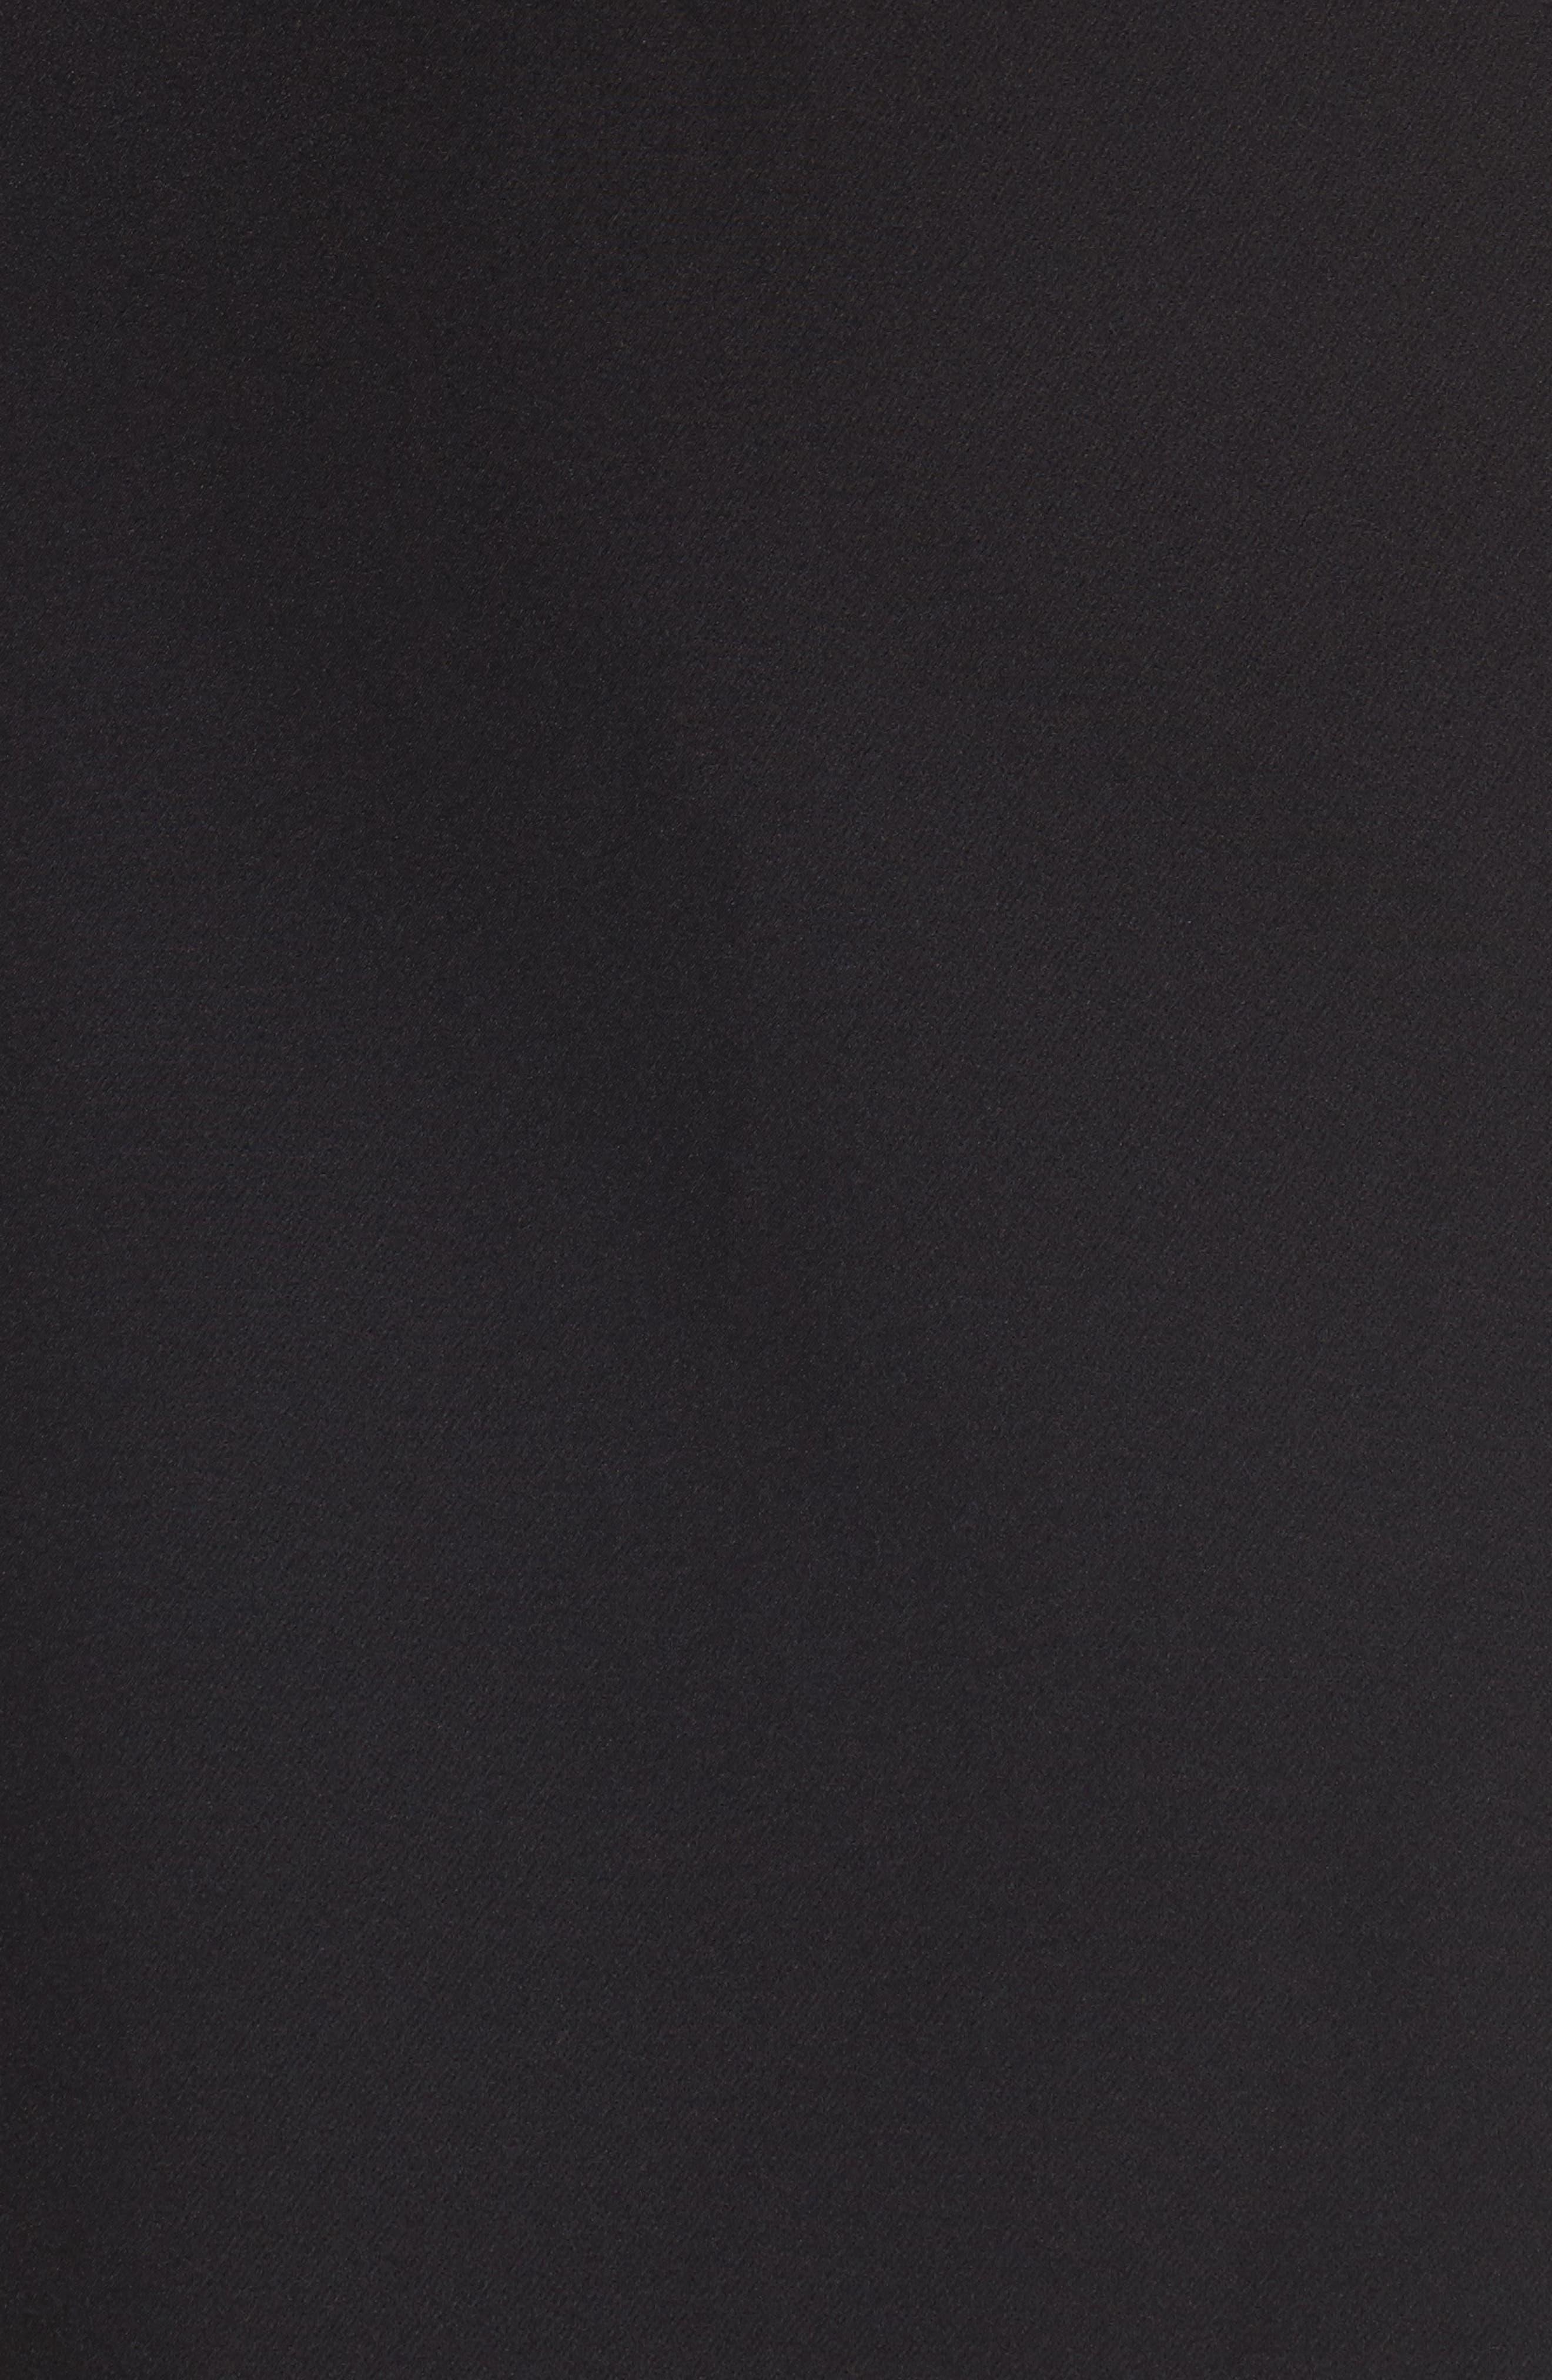 Layne One-Shoulder Dress,                             Alternate thumbnail 5, color,                             001